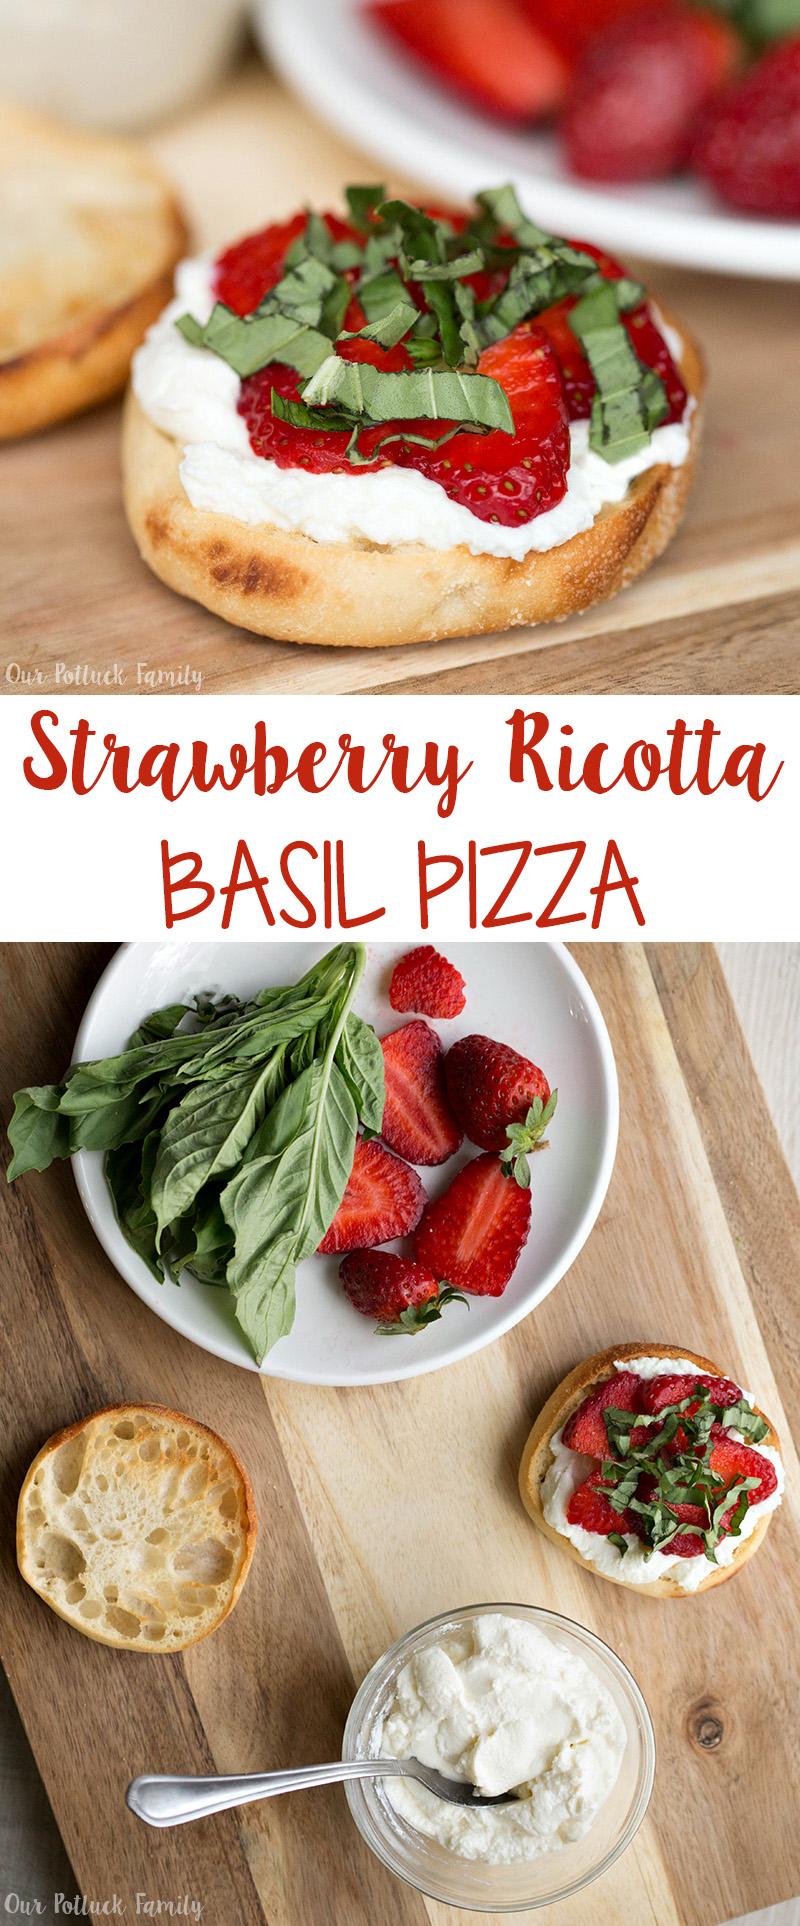 Strawberry Ricotta Basil Pizza